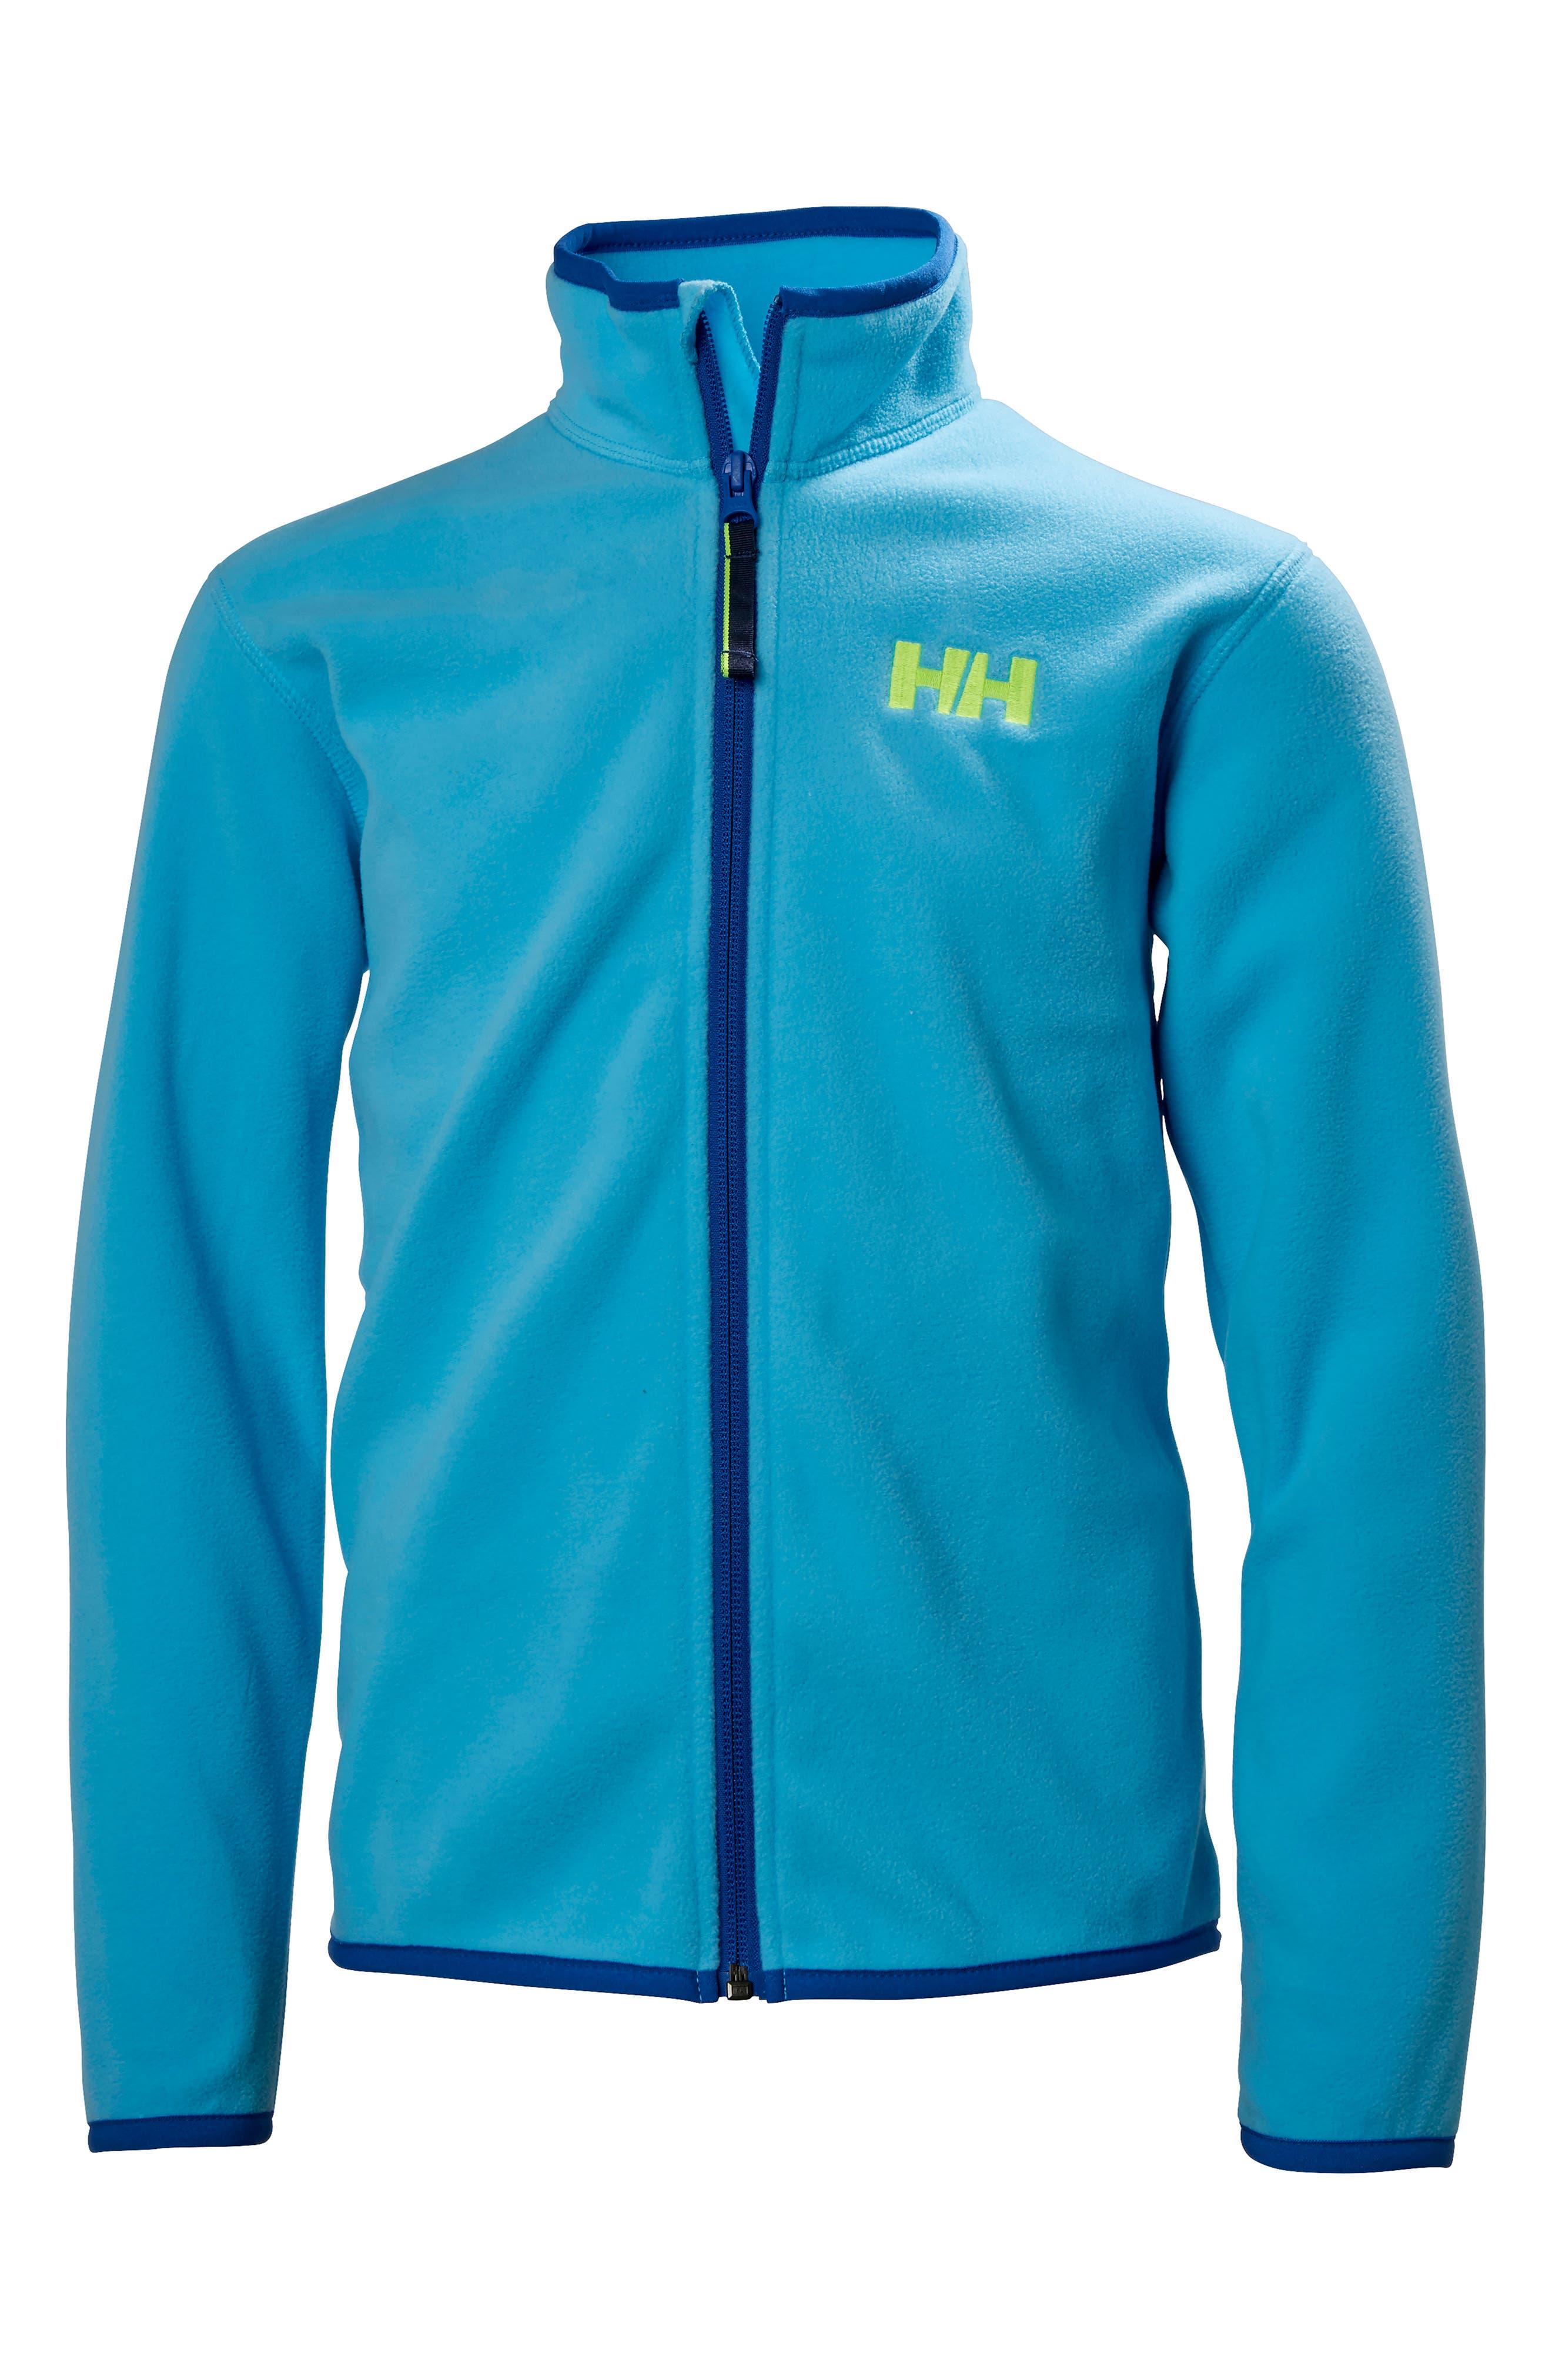 Jr. Daybreaker Polartec<sup>®</sup> Fleece Jacket,                             Main thumbnail 1, color,                             400